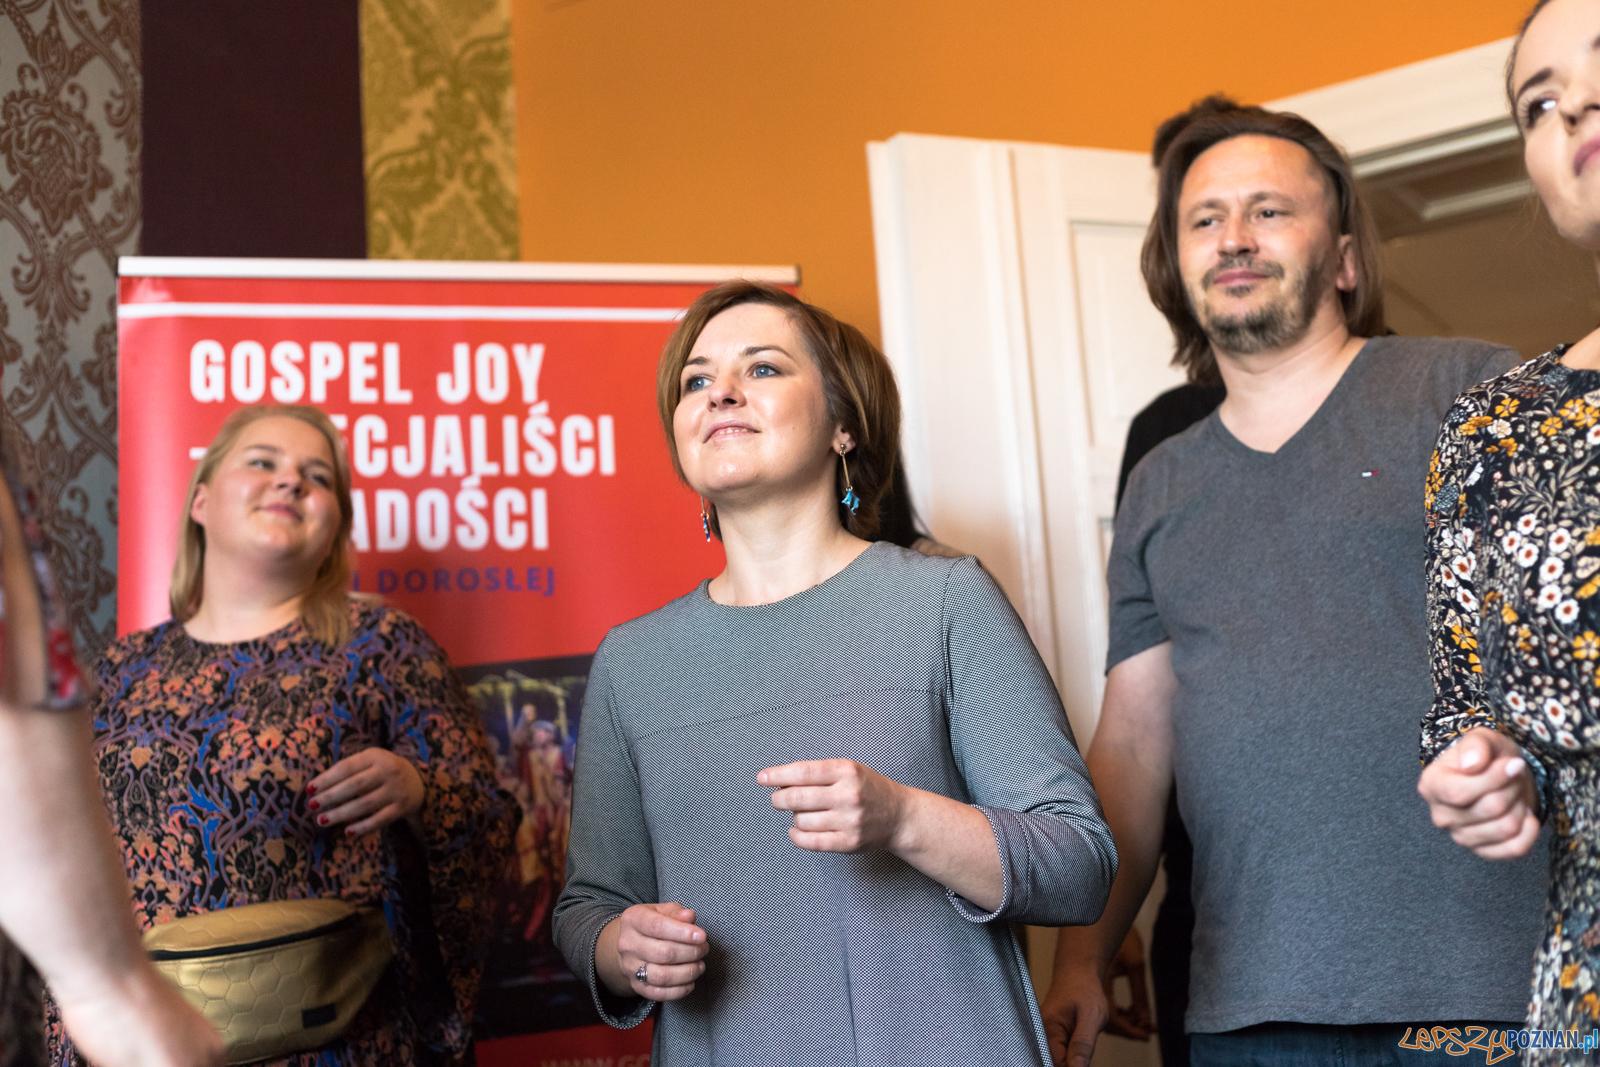 Gospel Joy - Prezentacja The Greatest Gospel Hits  Foto: lepszyPOZNAN.pl/Piotr Rychter